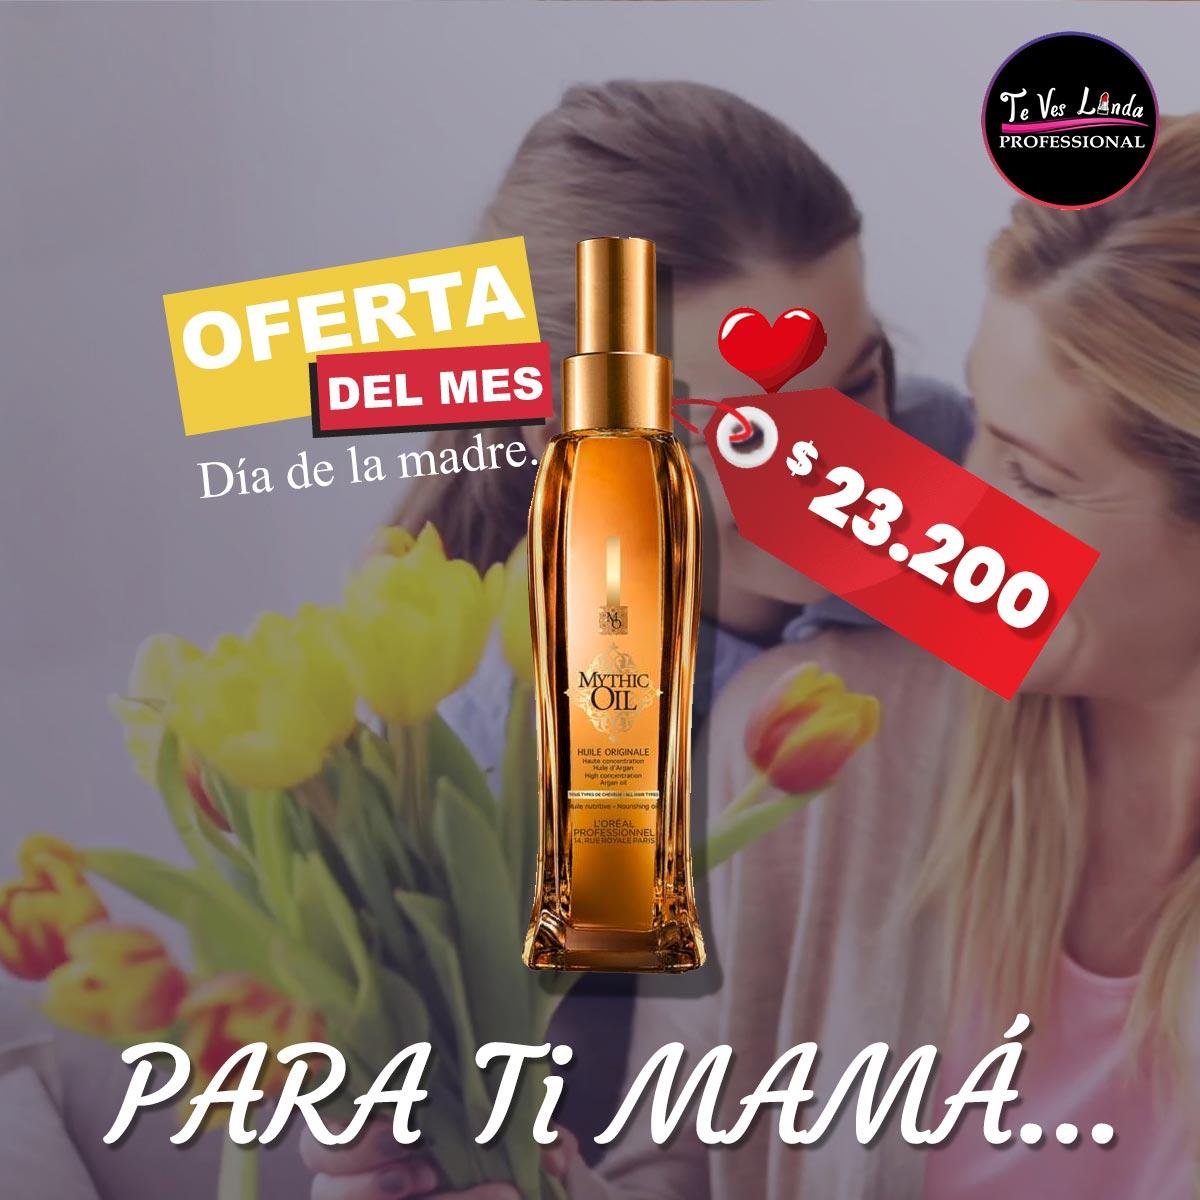 aceite mythic oils